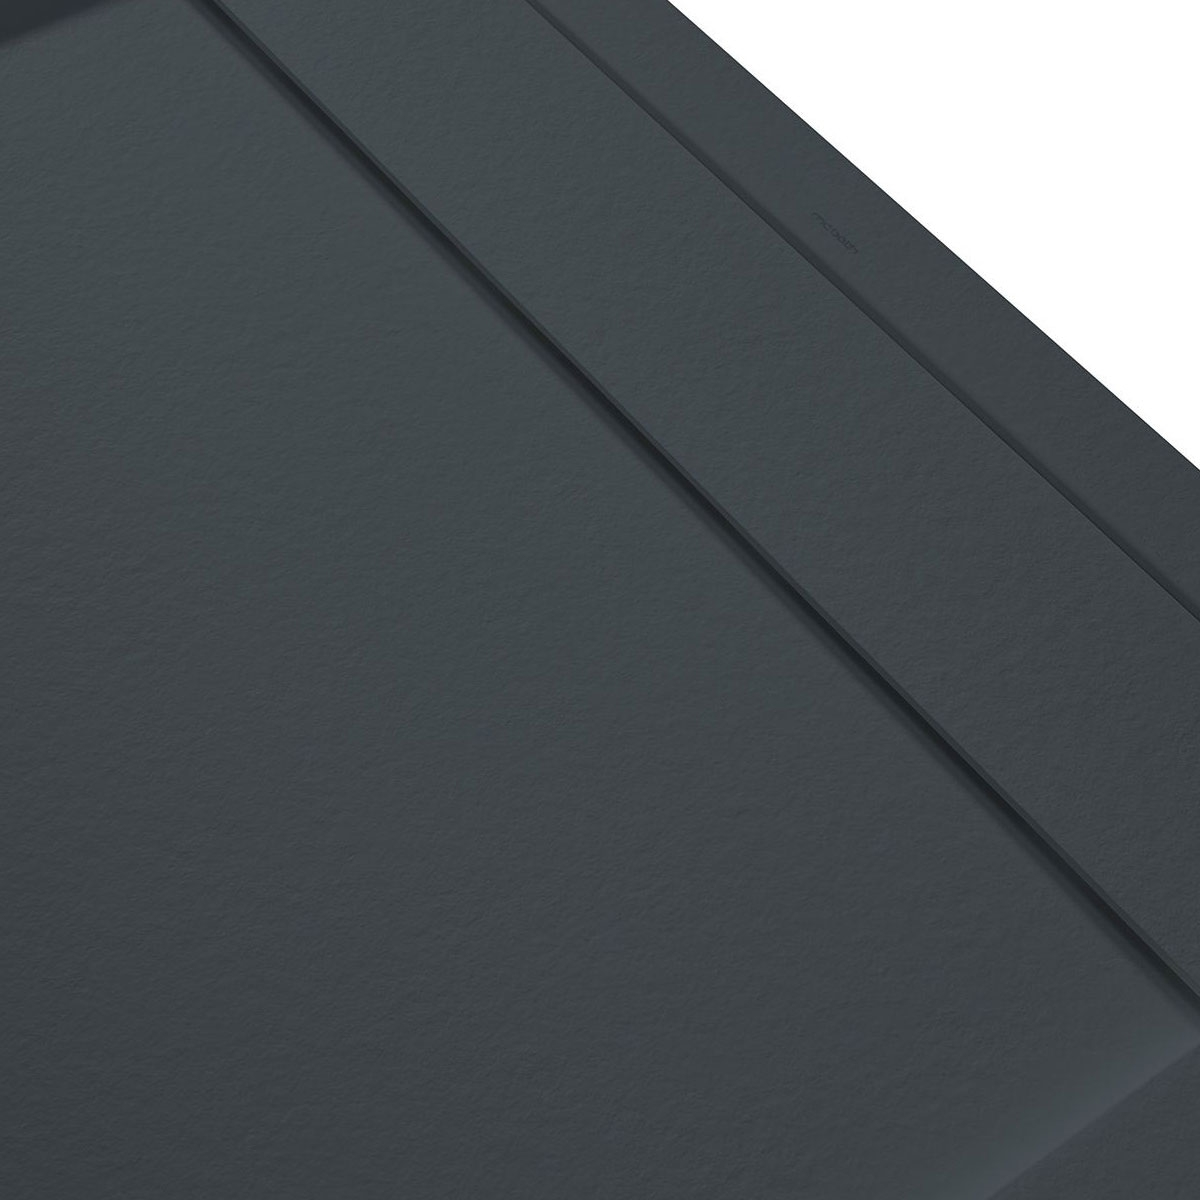 Plato de ducha rectangular 100x80 Andrómeda Stone Cover Antracita